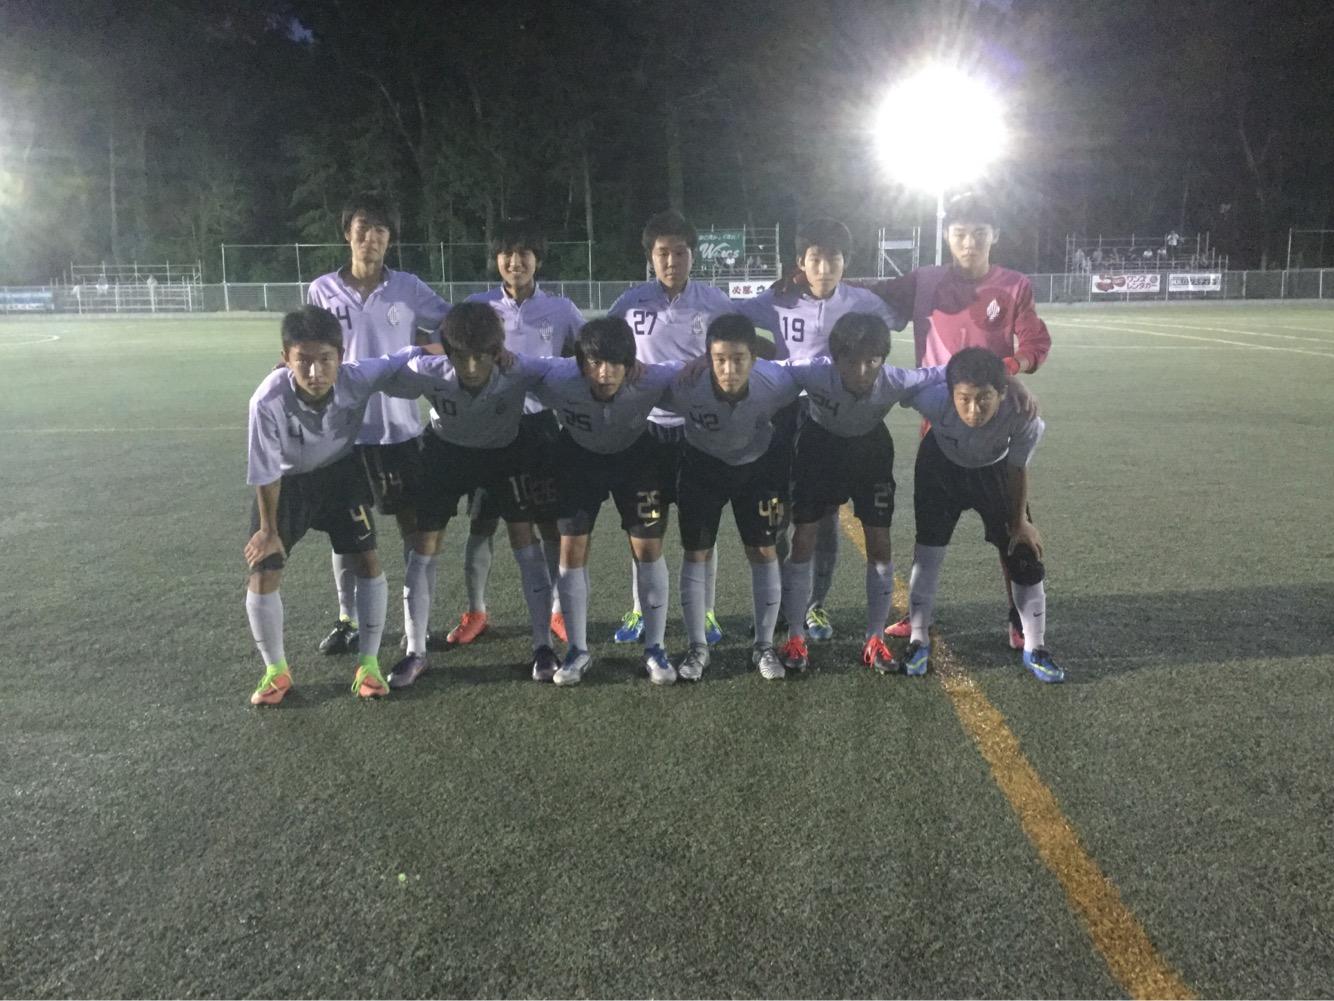 【U15】高円宮杯U-15サッカーリーグ2017千葉 1部リーグ第17節